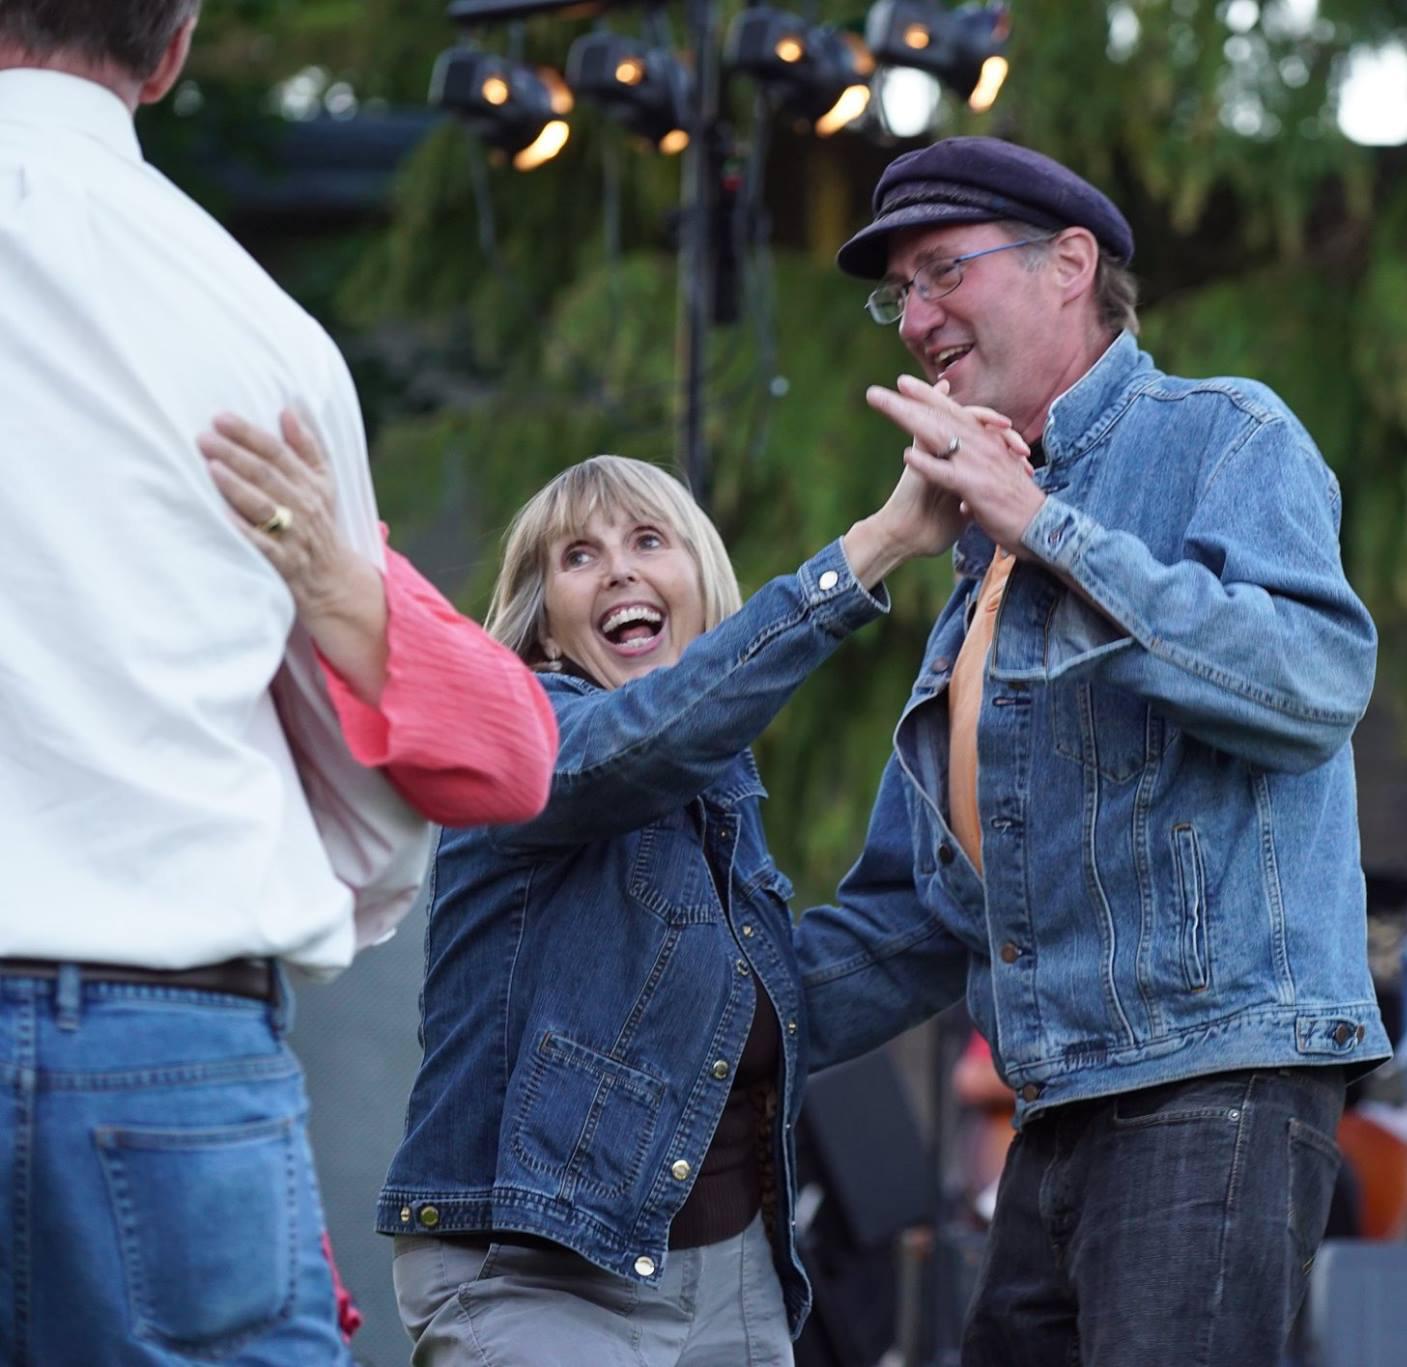 Troy and Marie Dancing.jpg